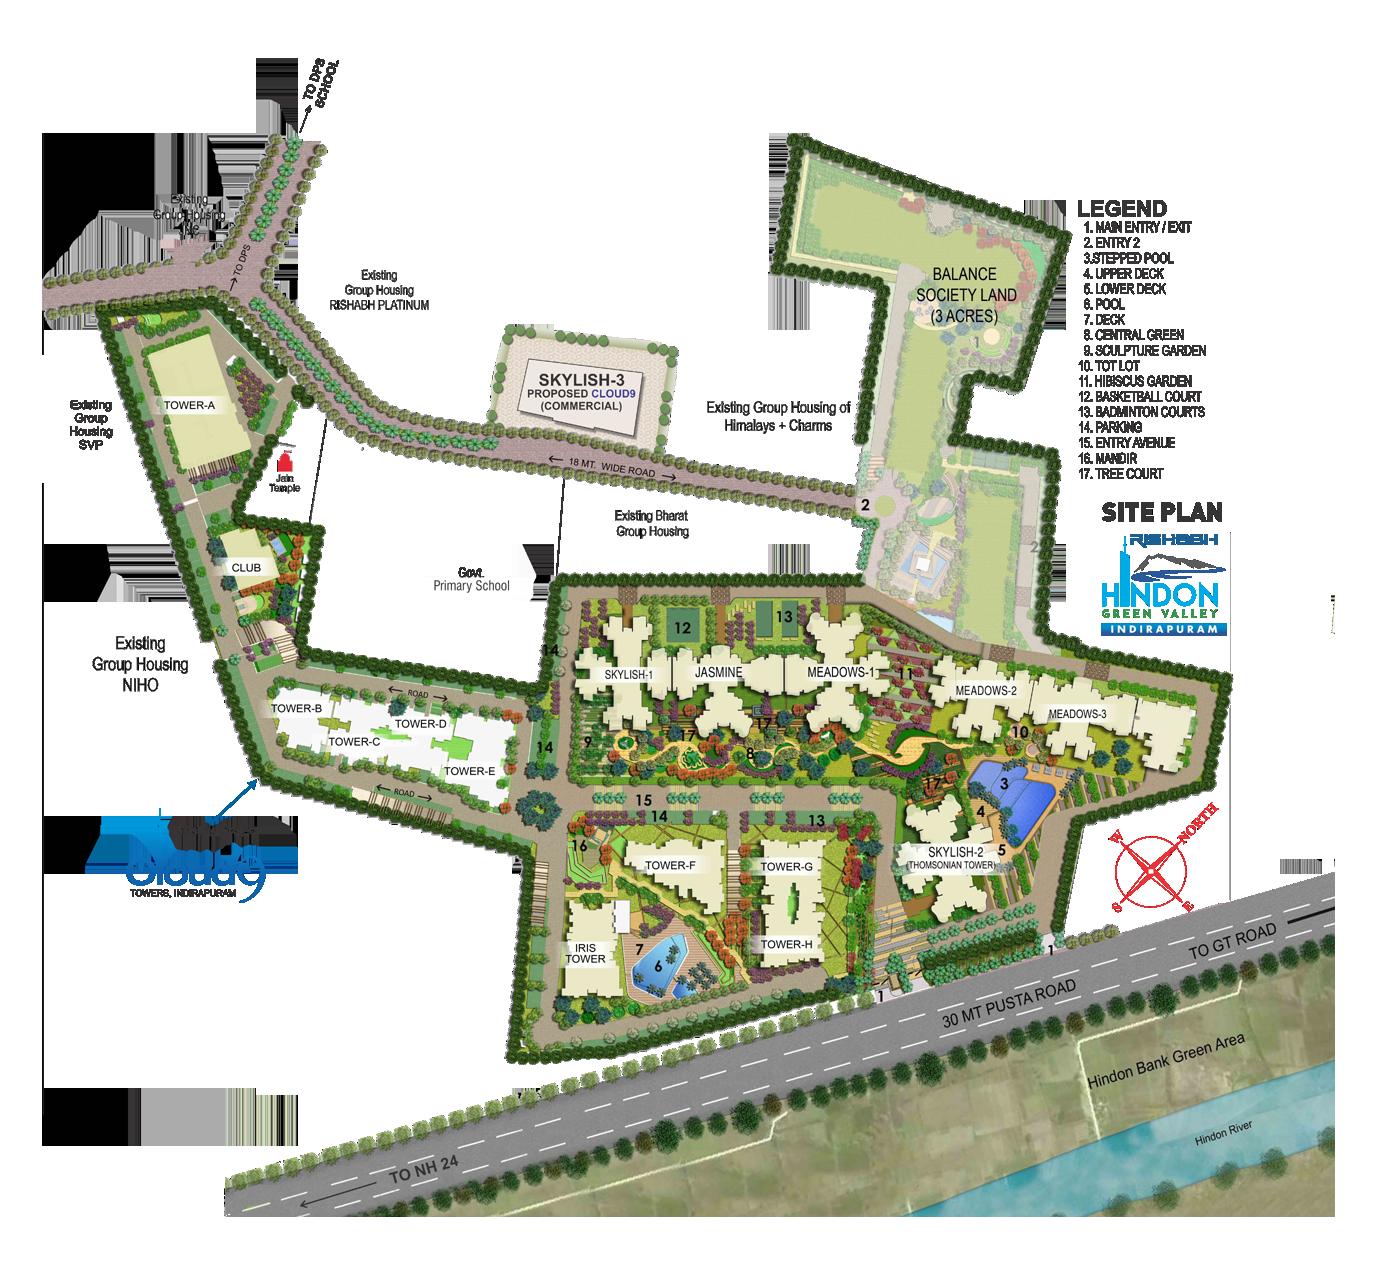 Cloud 9 skylish indirapuram ghaziabad flats in indirapuram price - Enquiry Form